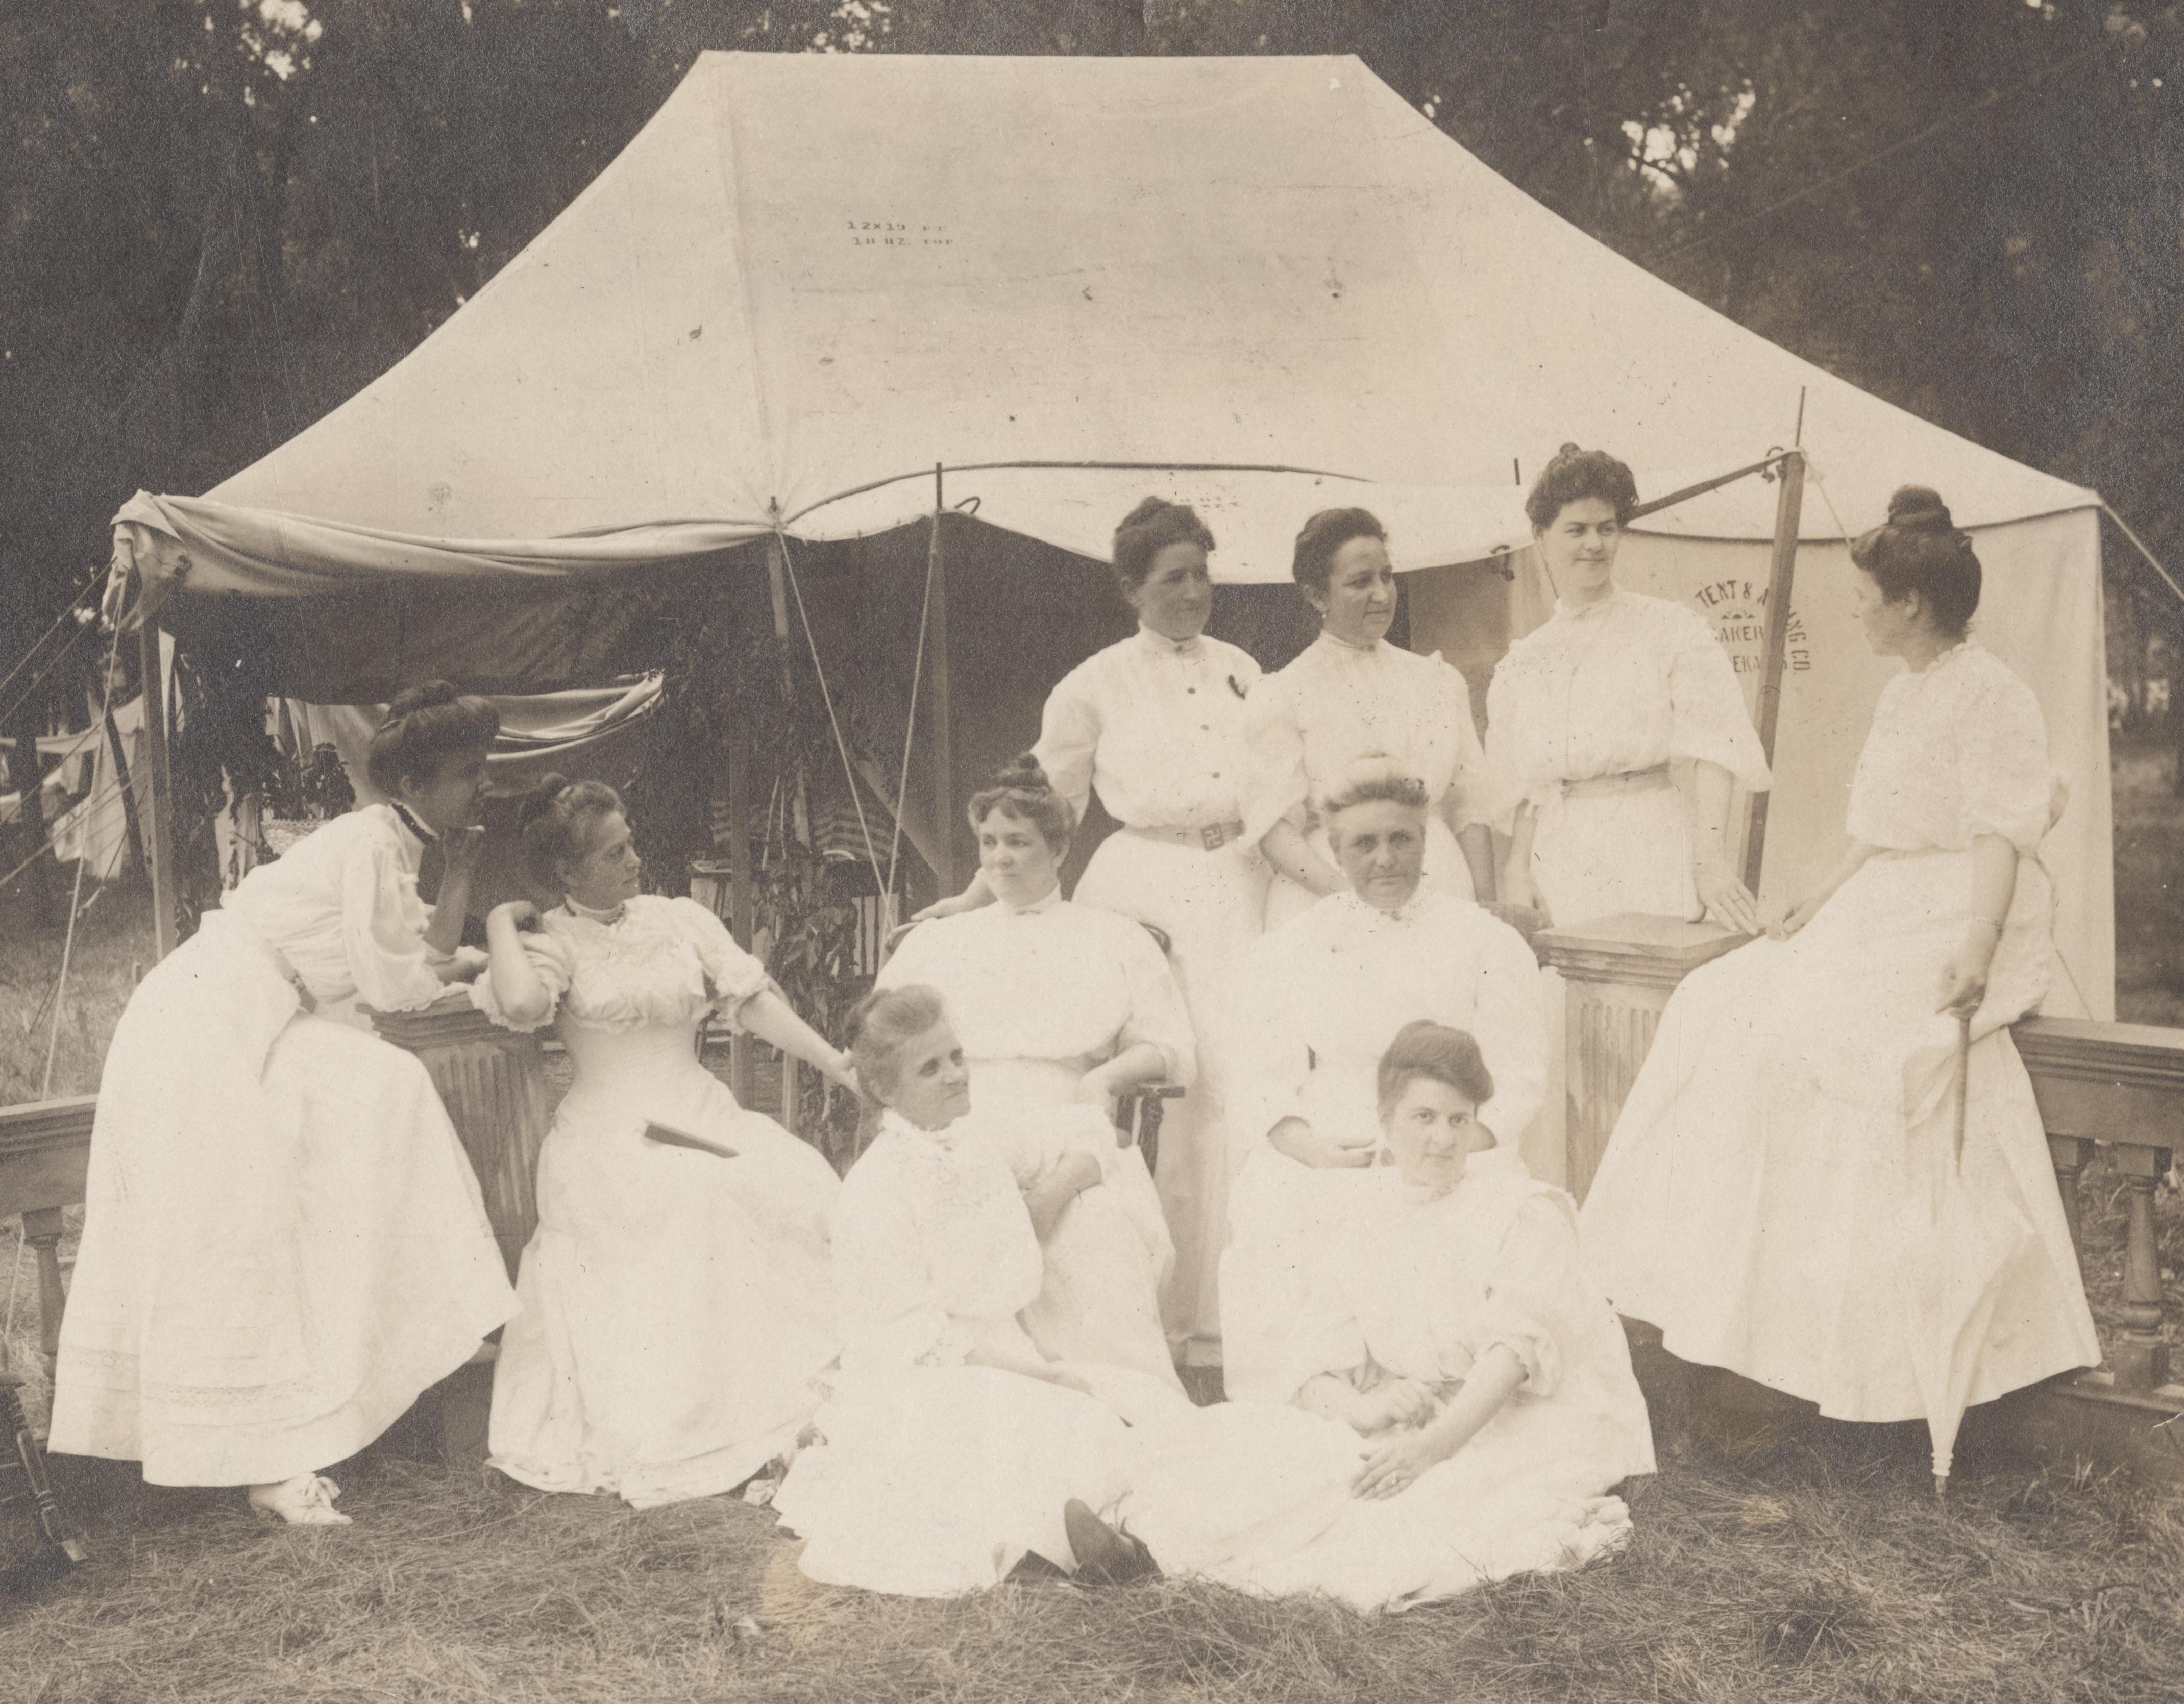 Online Program - Politics on the Platform: Woman Suffrage at the Chautauqua image